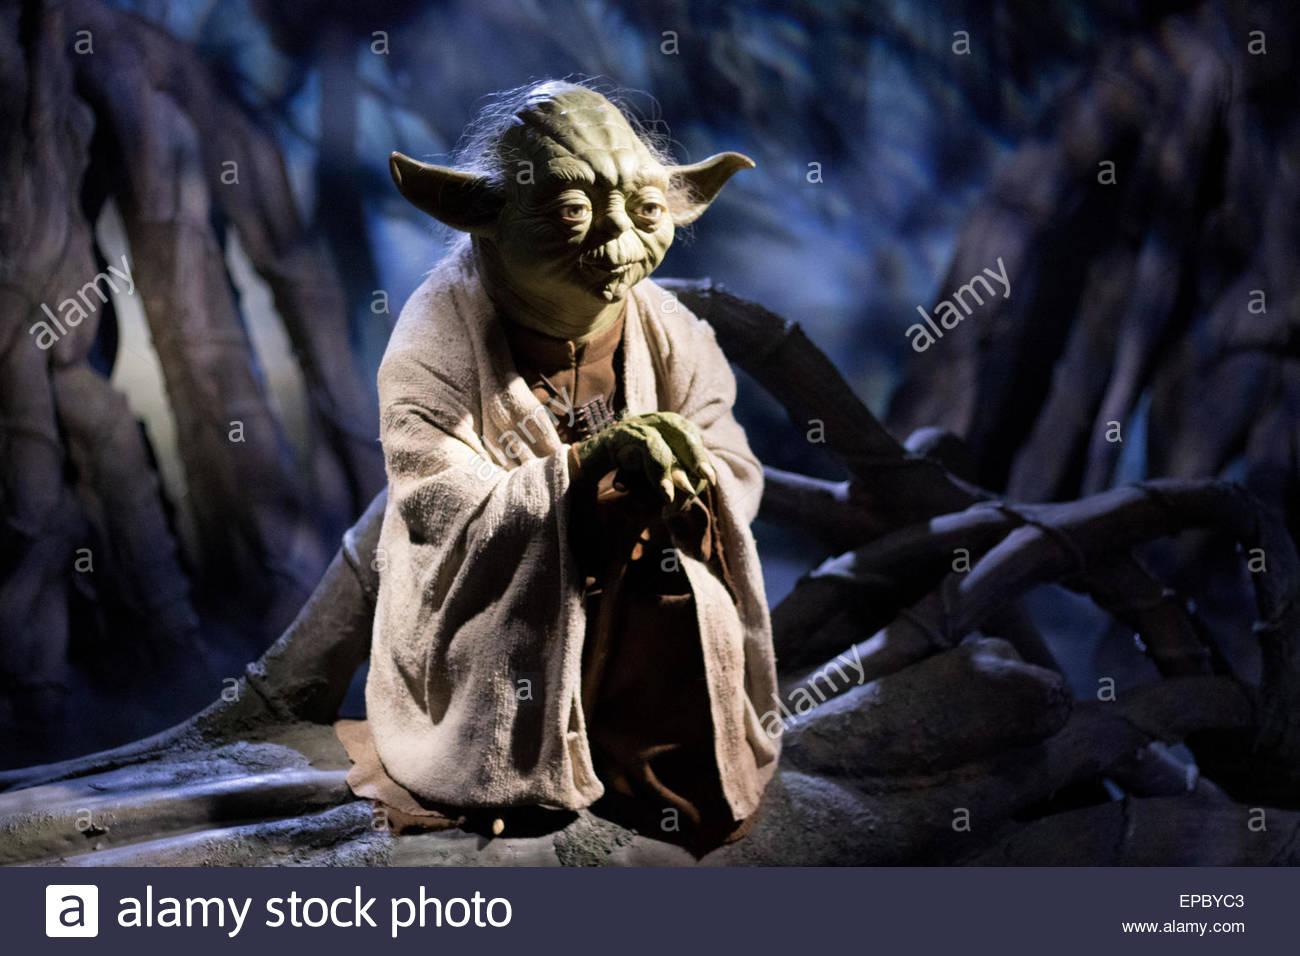 Puppet Yoda At Madame Tussauds London Stock Photo, Royalty